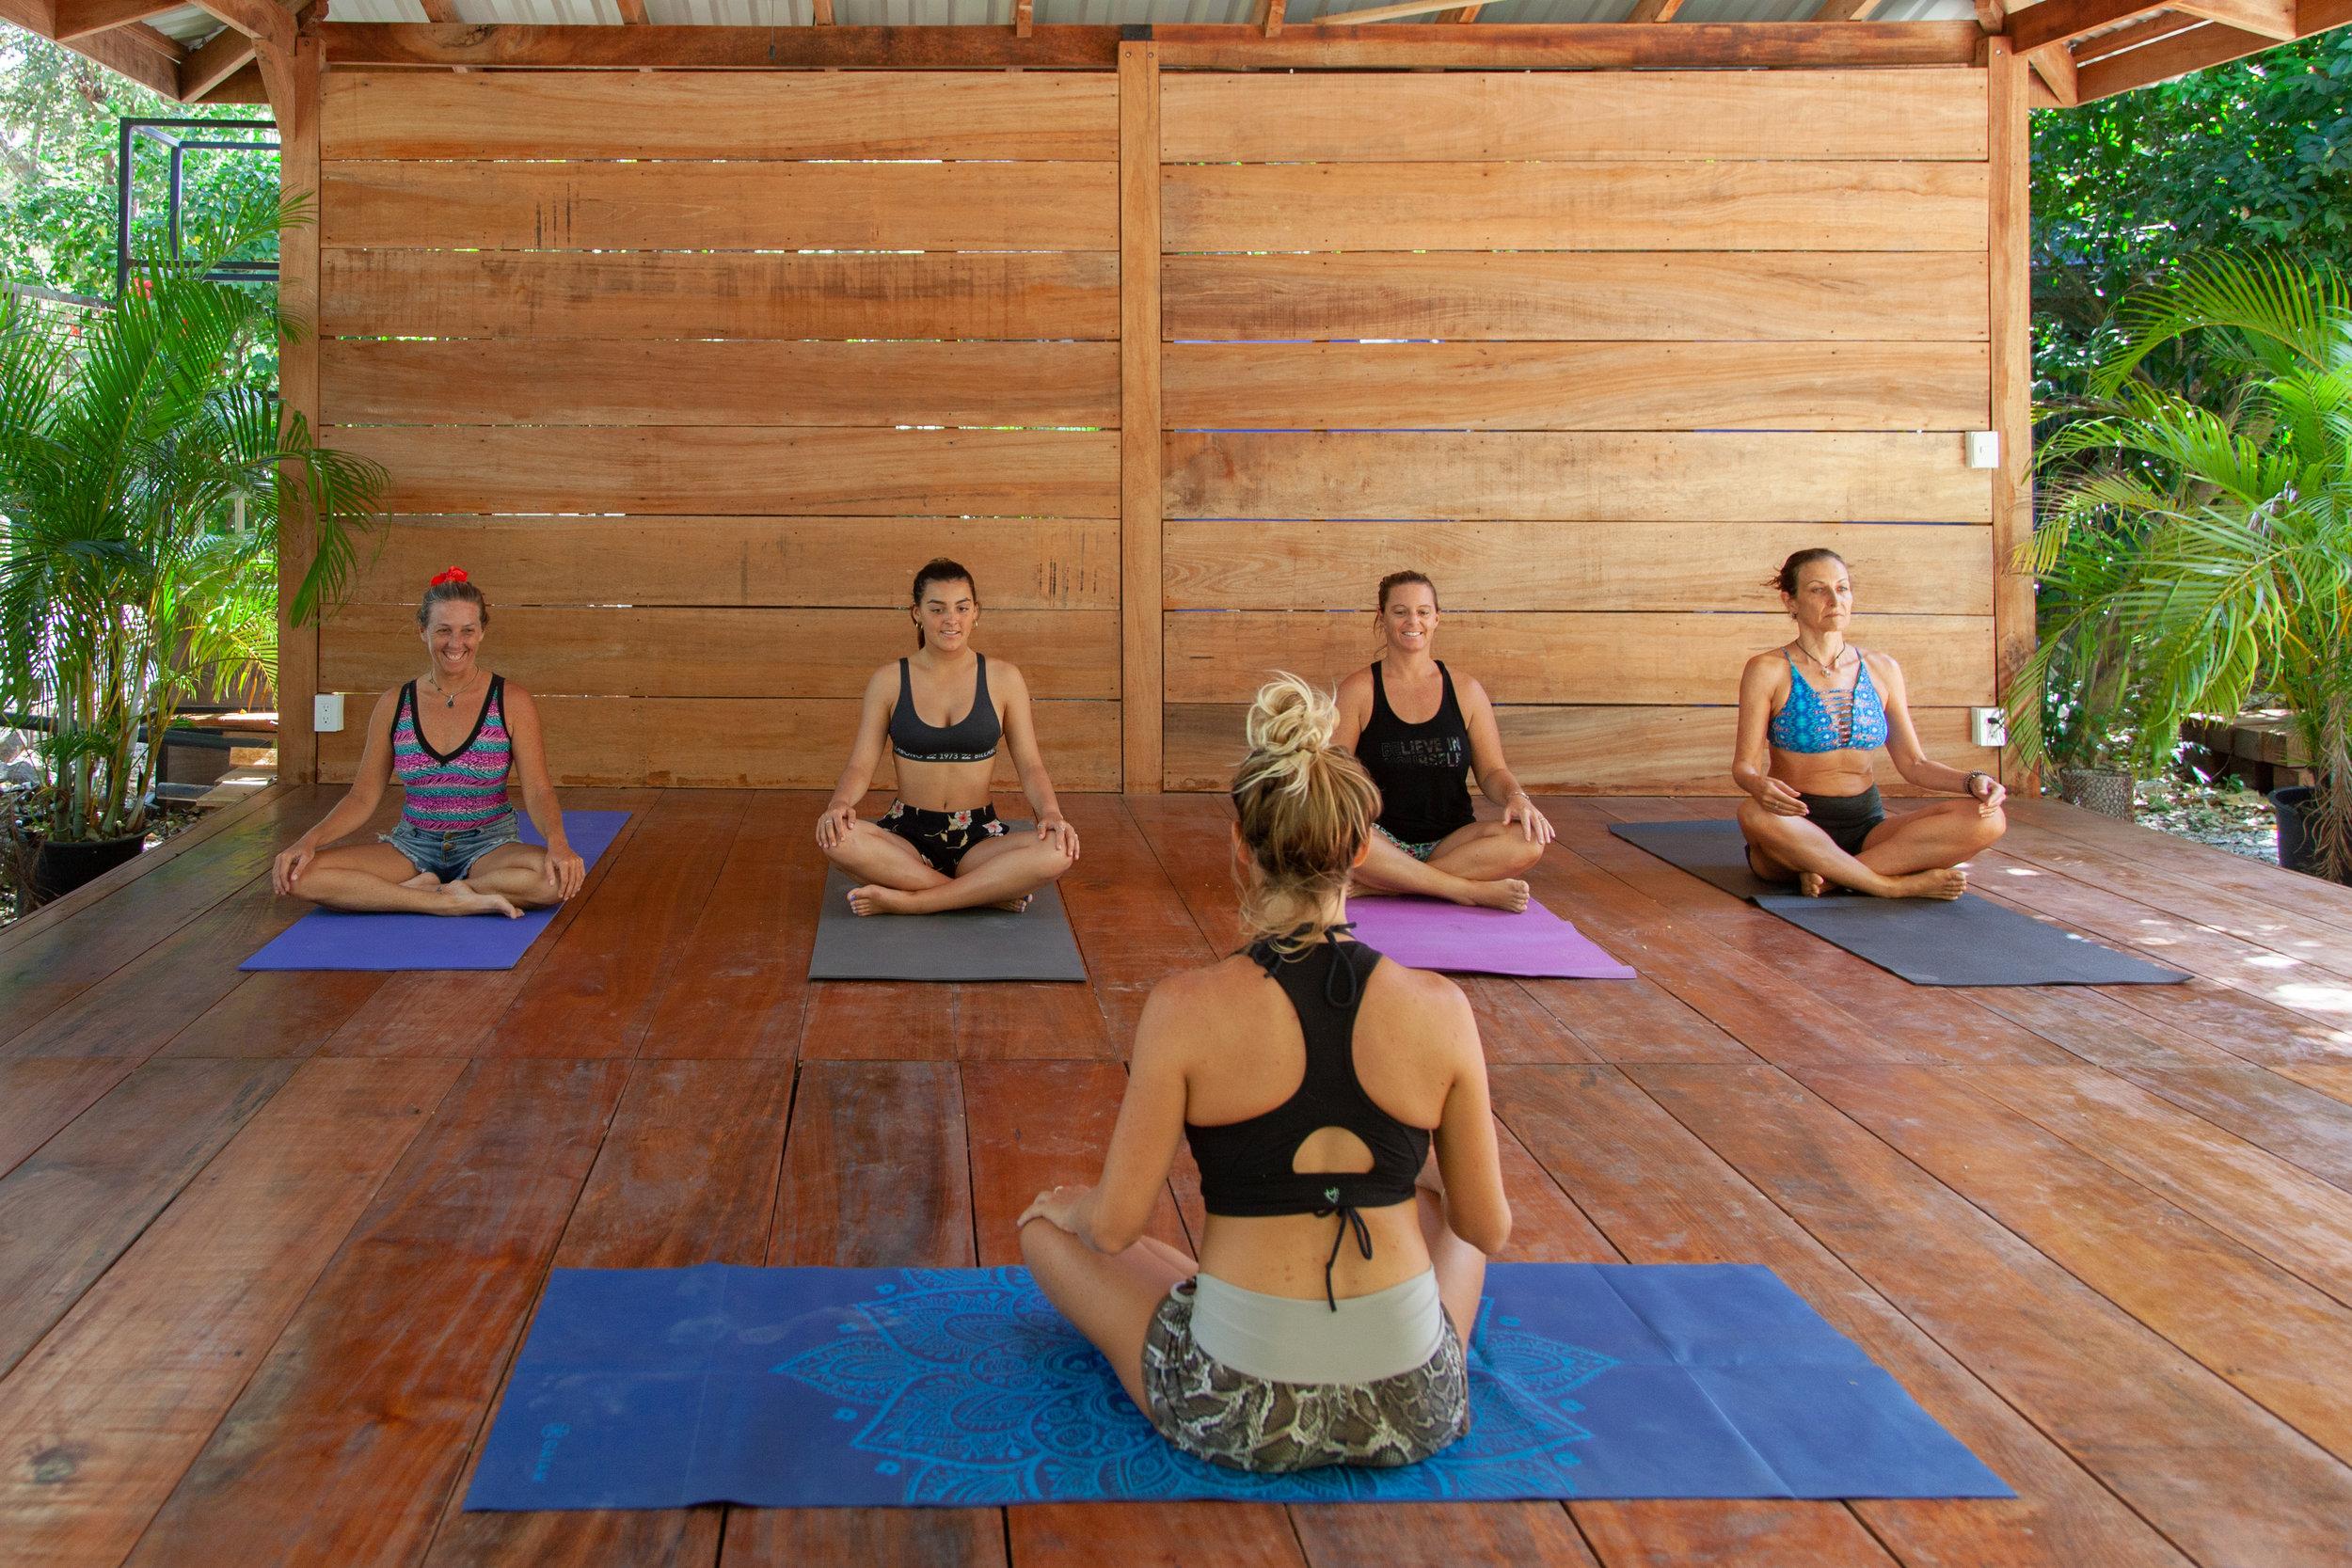 Costa Rica Yoga and Surf 20190102-6.jpg